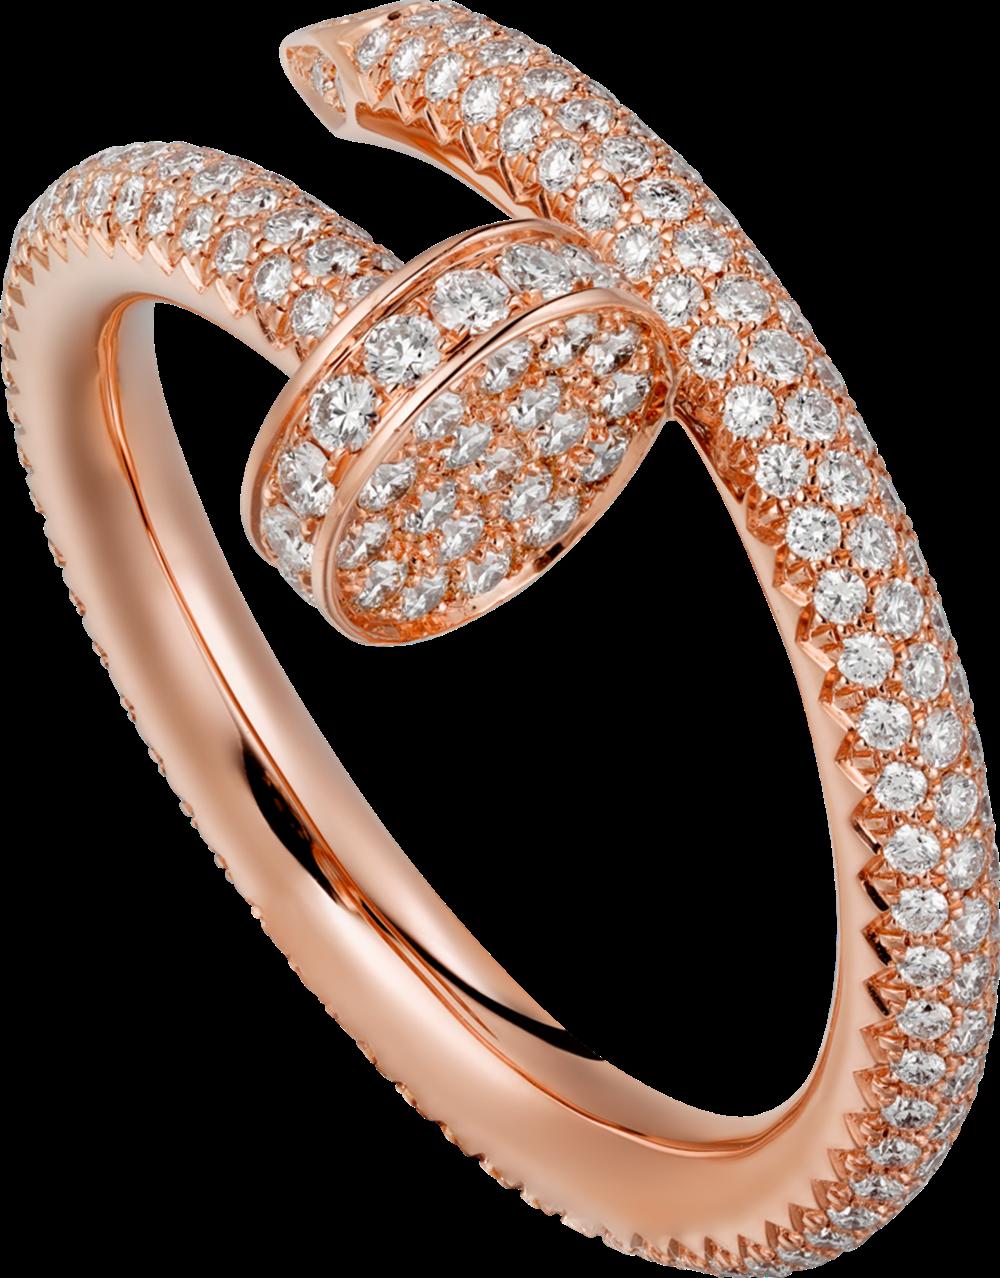 Juste un Clou玫瑰金鋪鑲鑽戒指玫瑰K金,鋪鑲鑽石,參考價格約NT$ 402,000另有白K金款